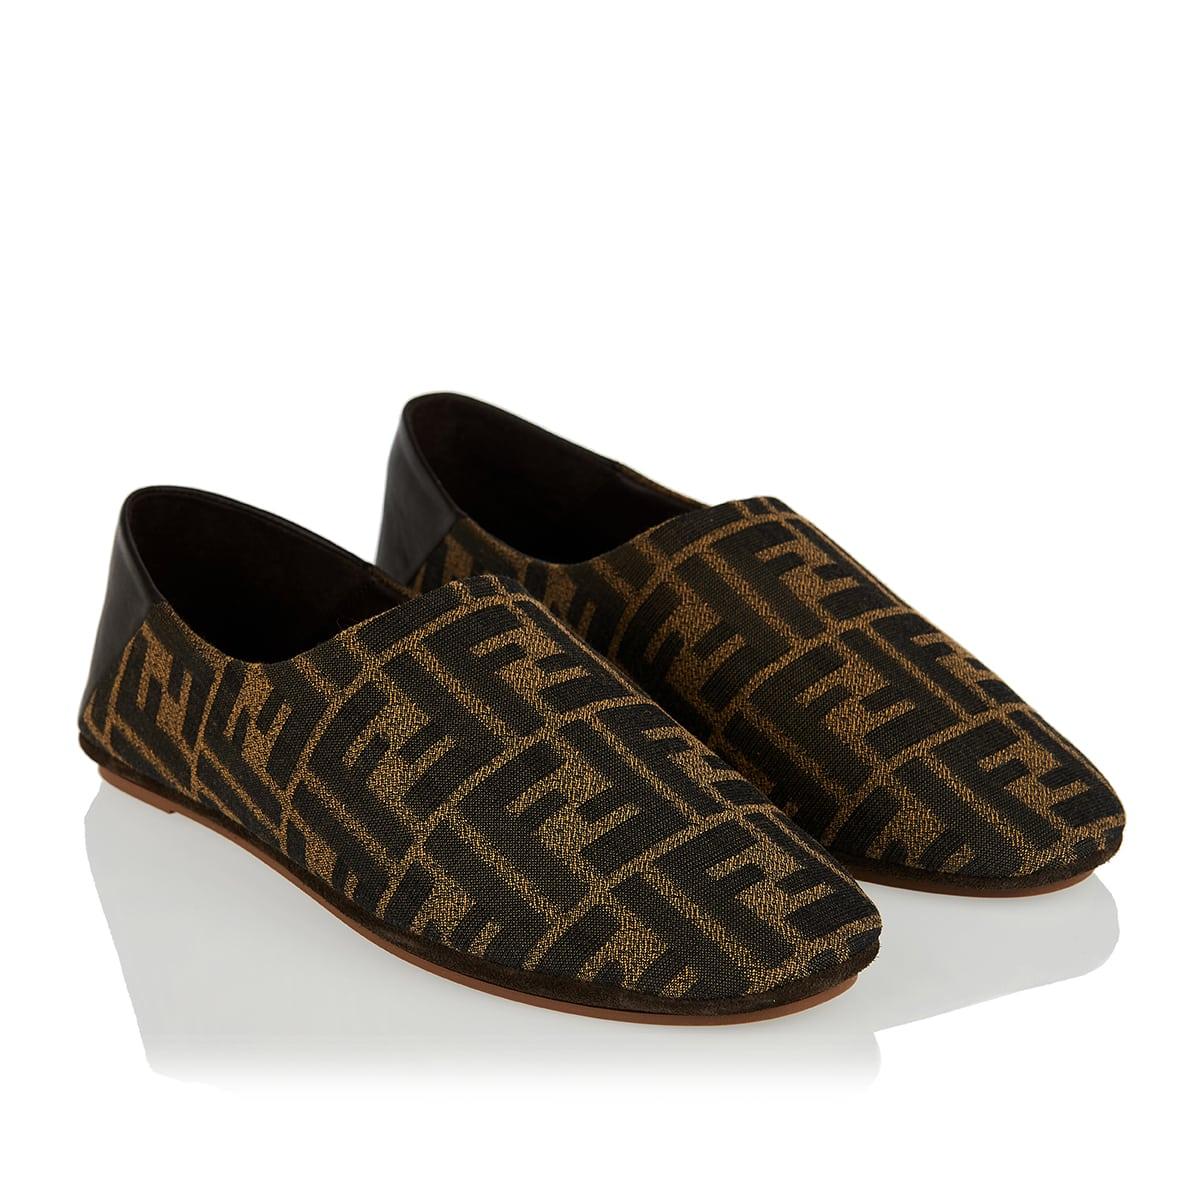 FF jacquard slippers